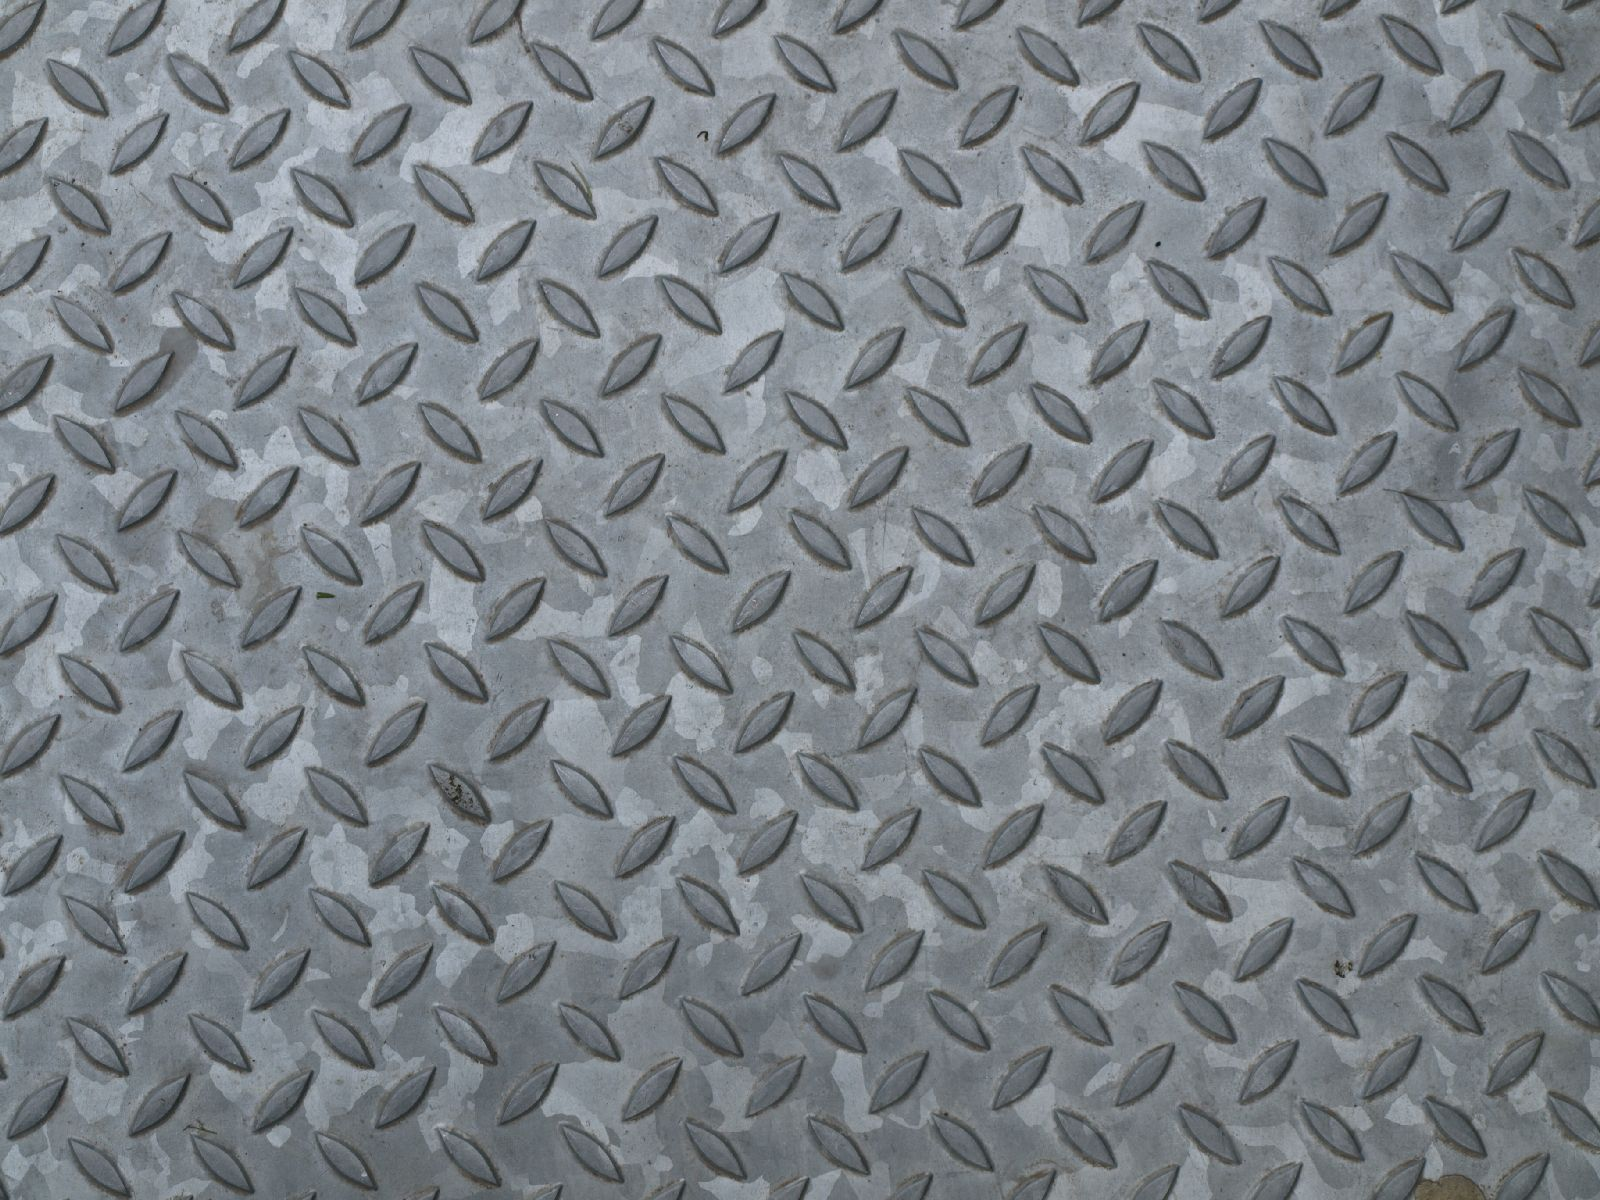 Metall_Textur_A_P4110696